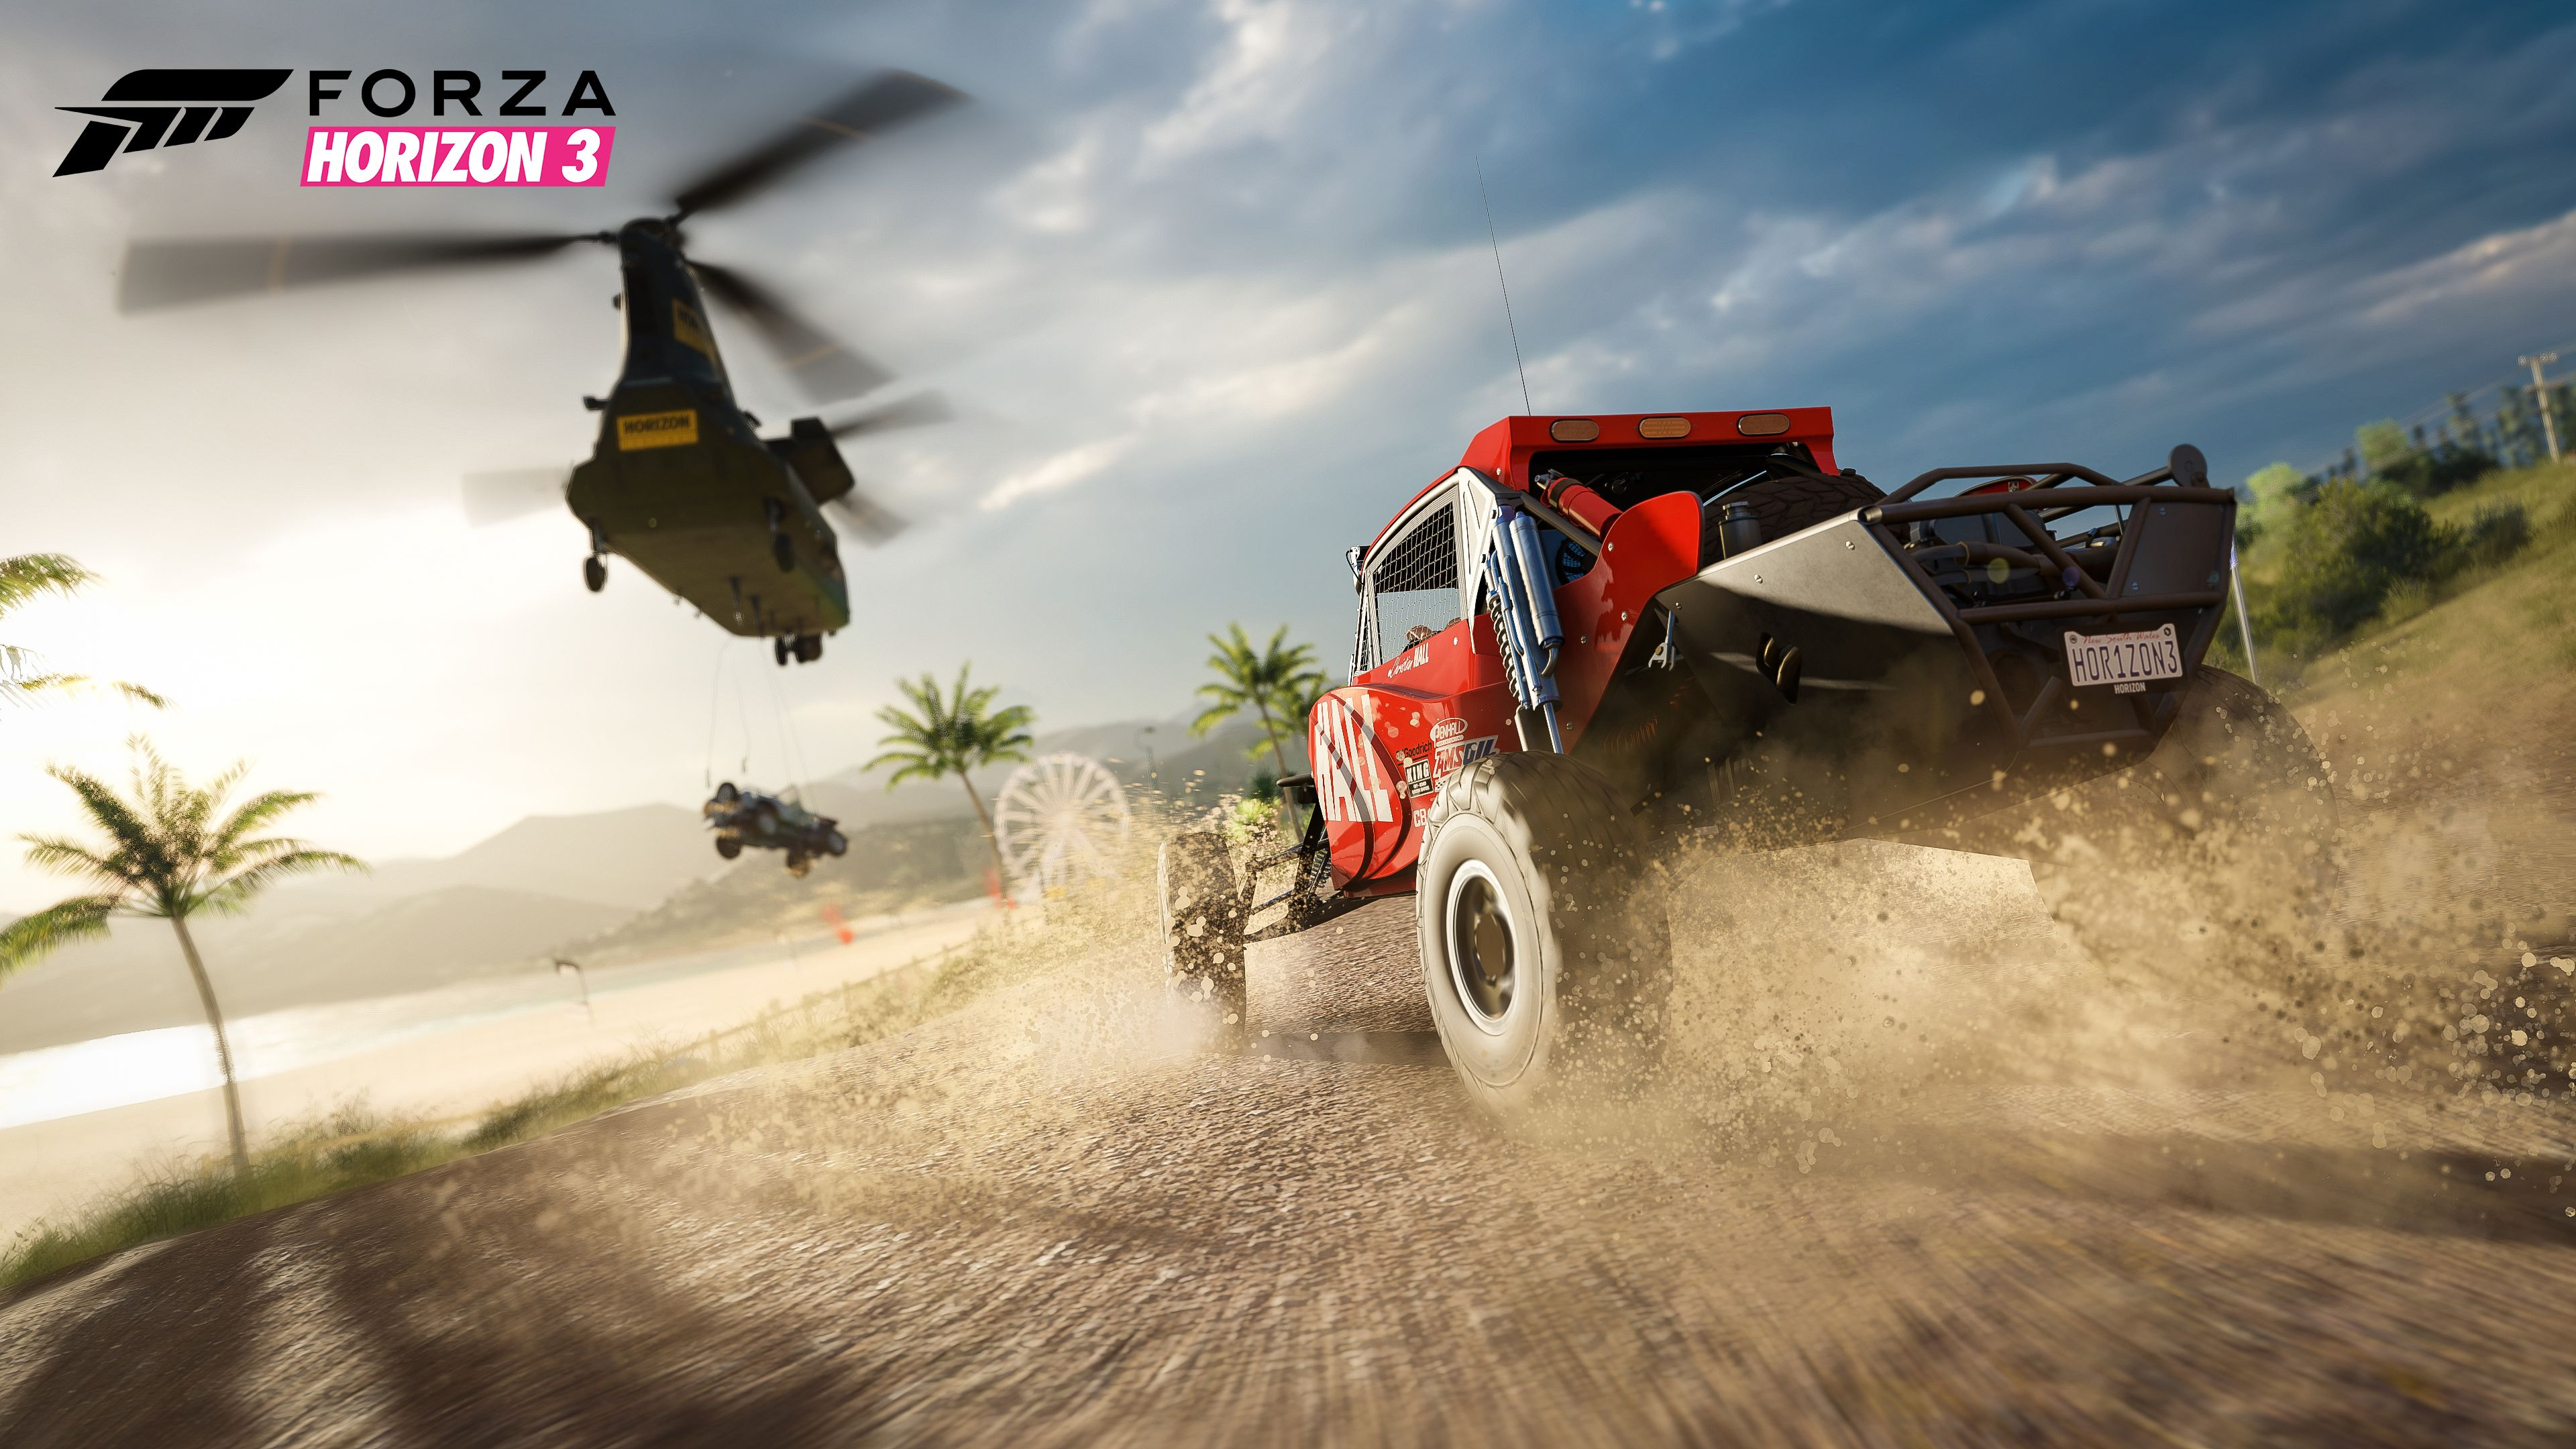 Forza Horizon 3 4k Ultra HD Wallpaper